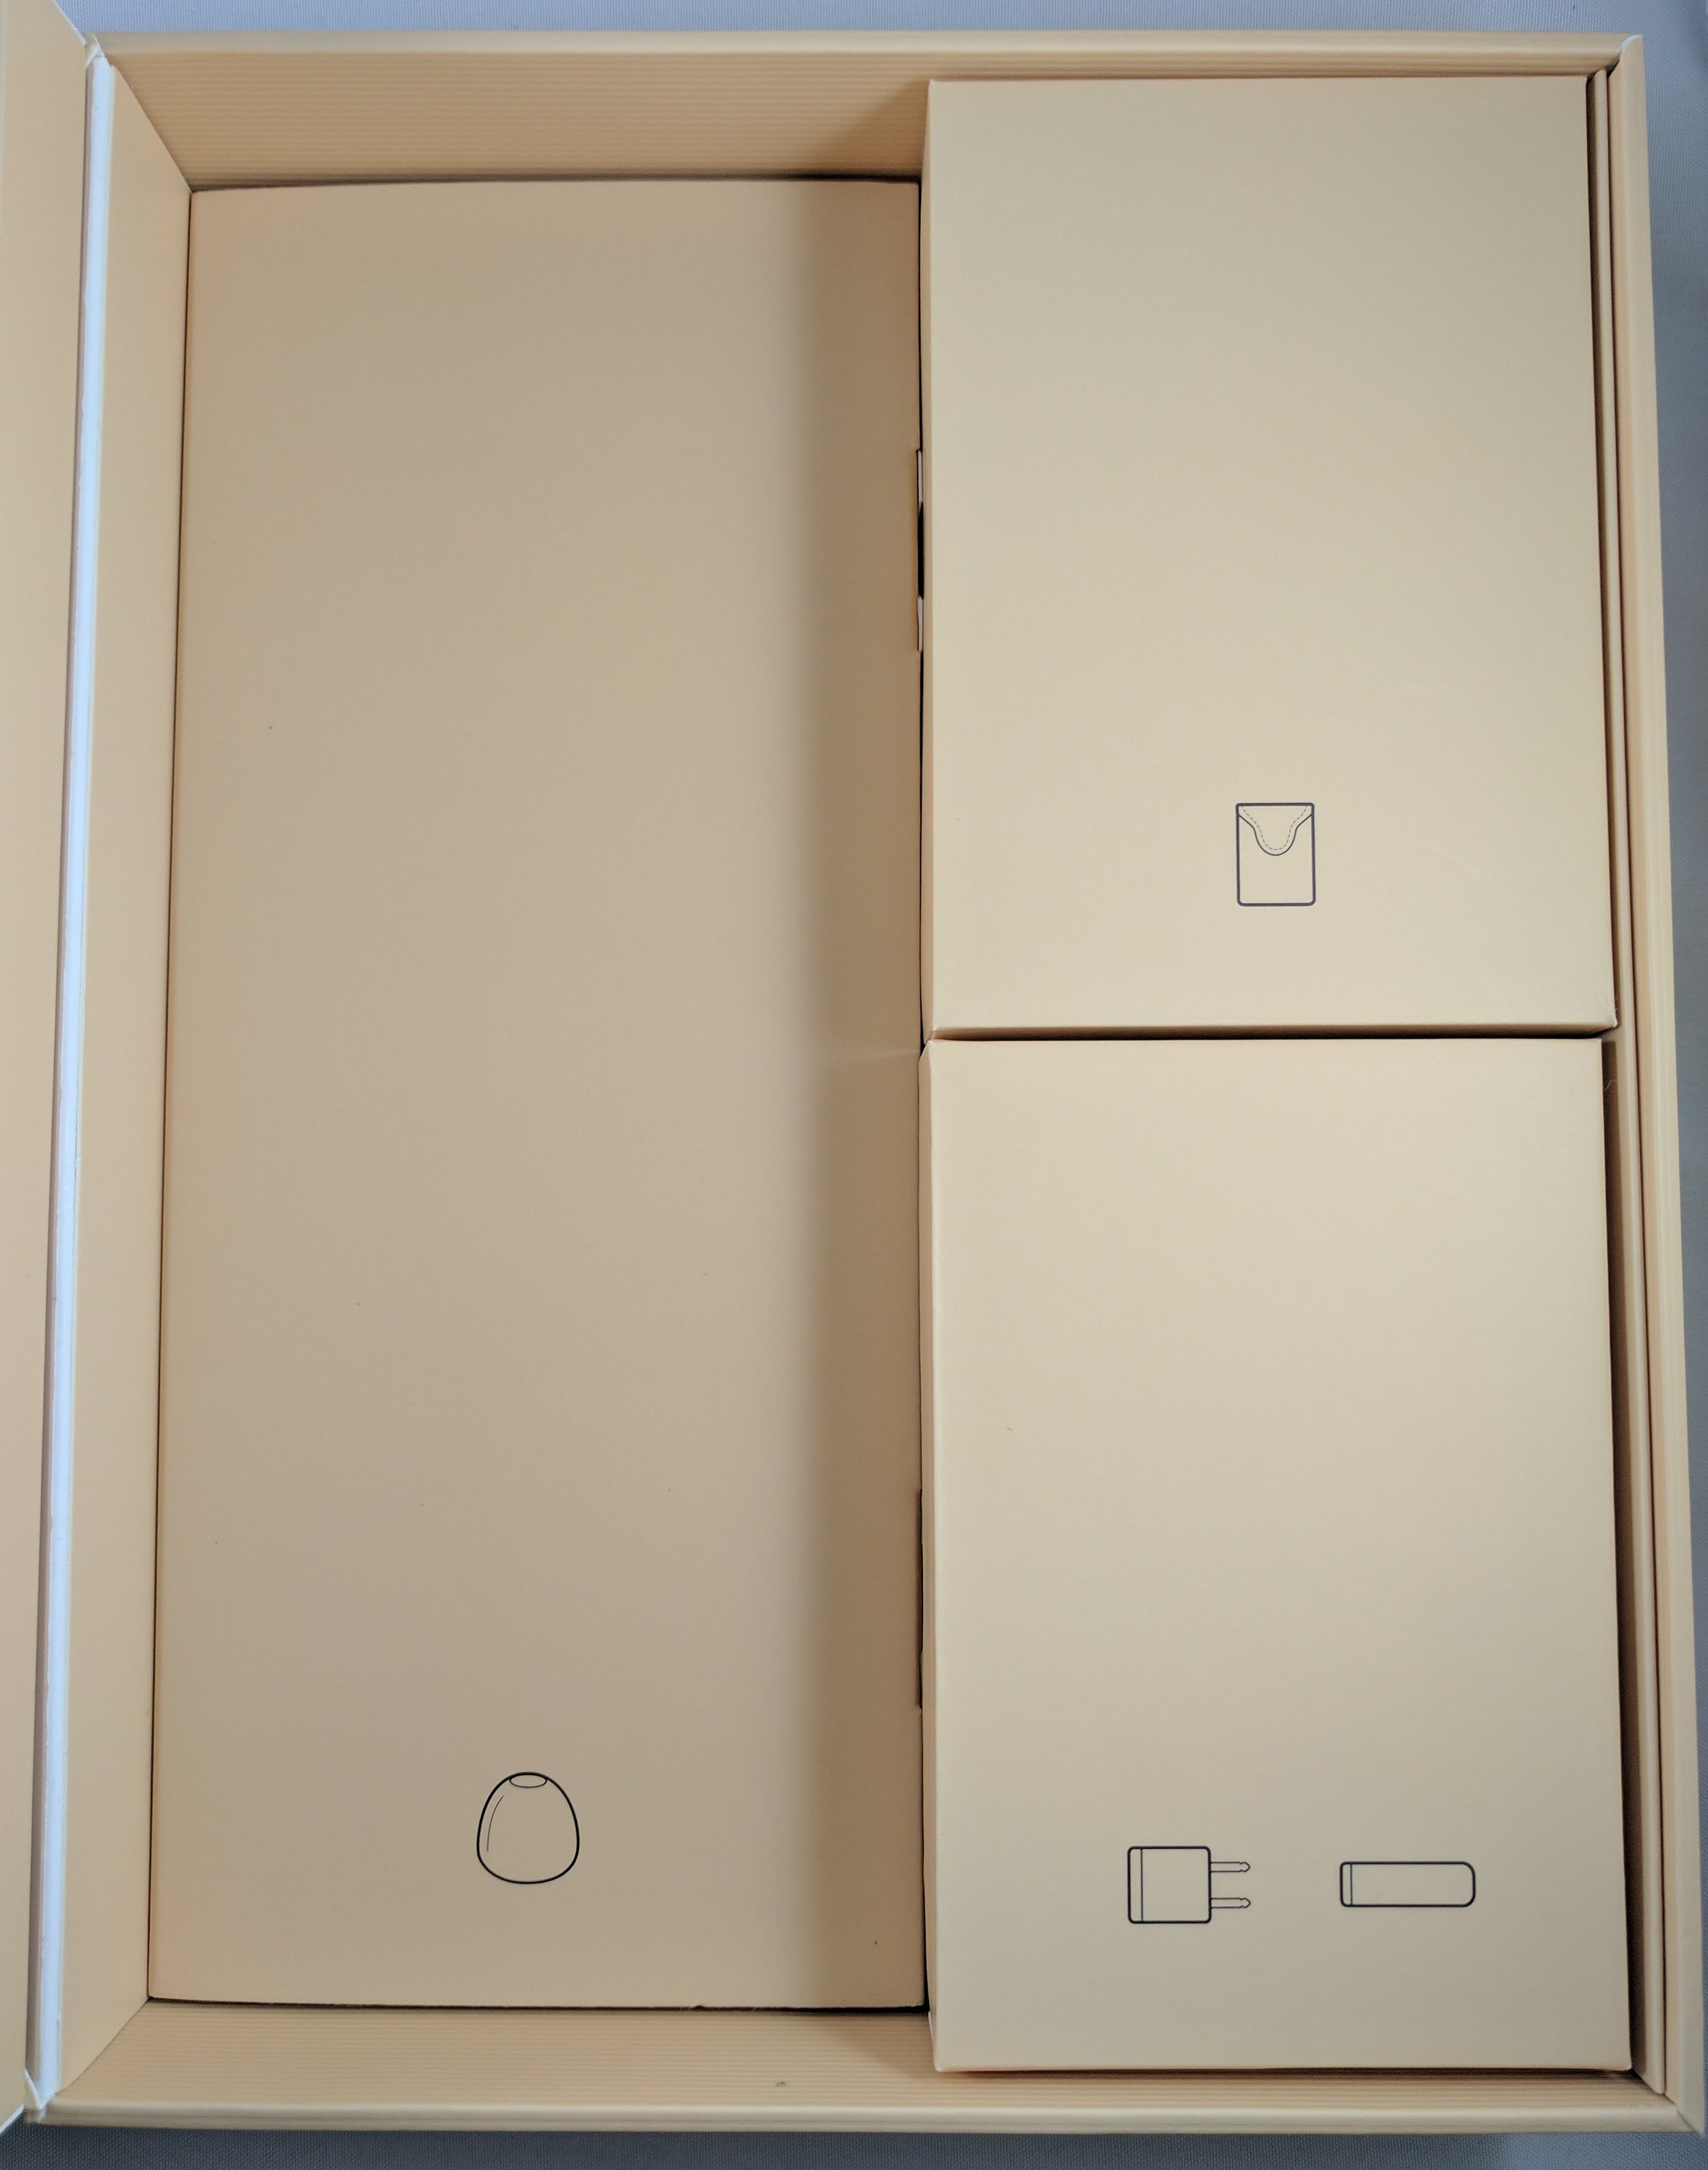 5 Box Contents 2.jpg